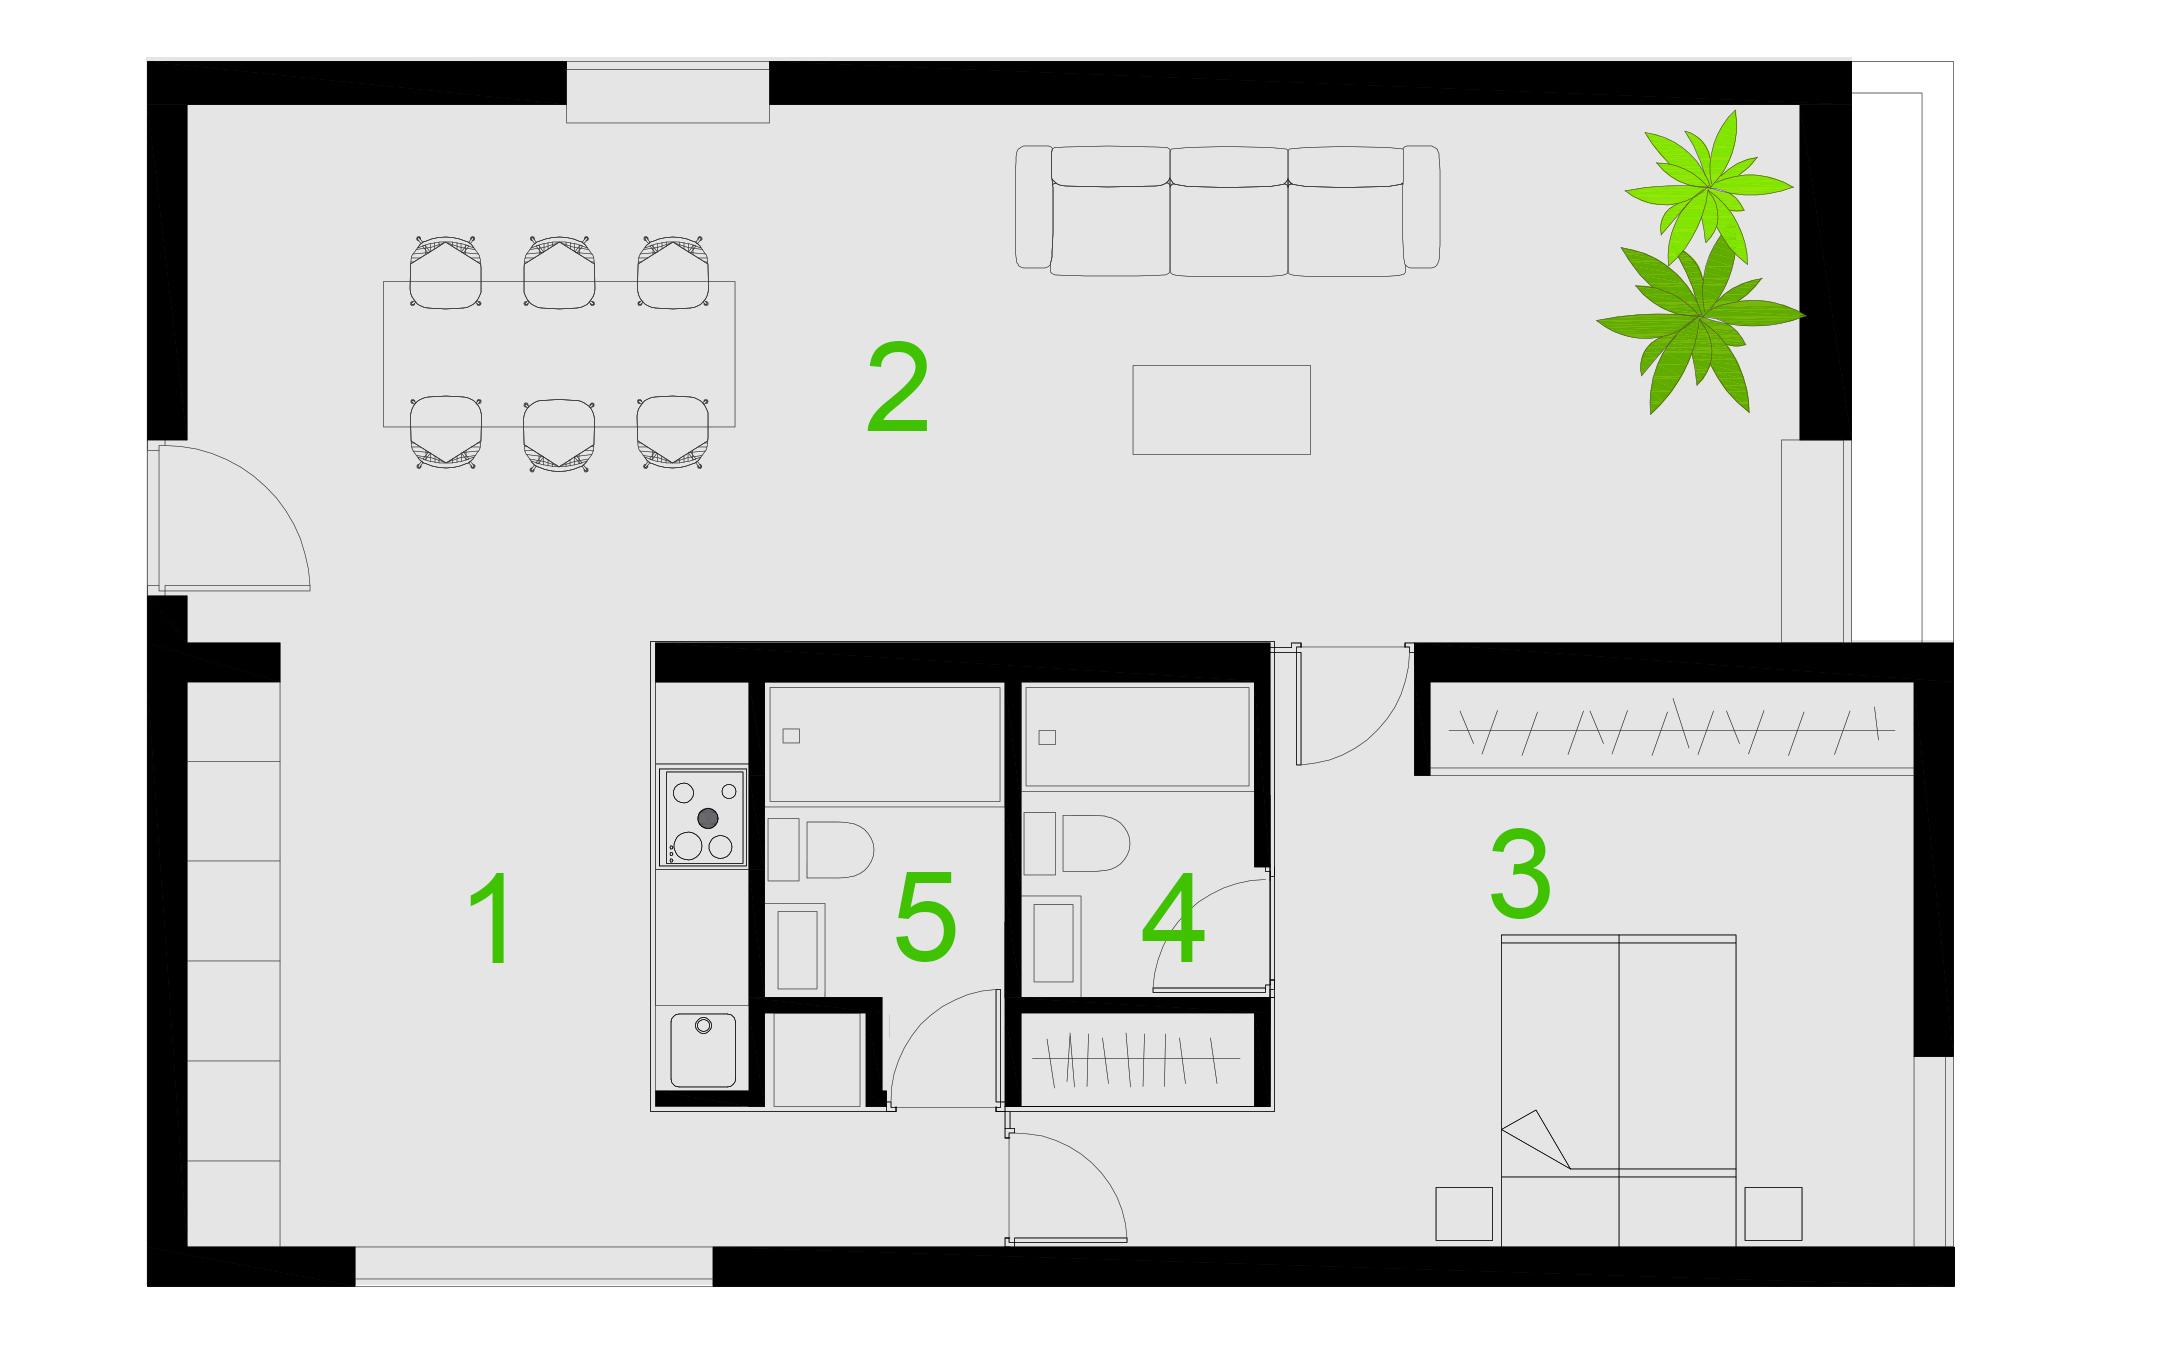 1- KITCHEN . 2- LIVINGROOM. 3-BEDROOM  4- BATHROOM1 . 5- BATHROOM2